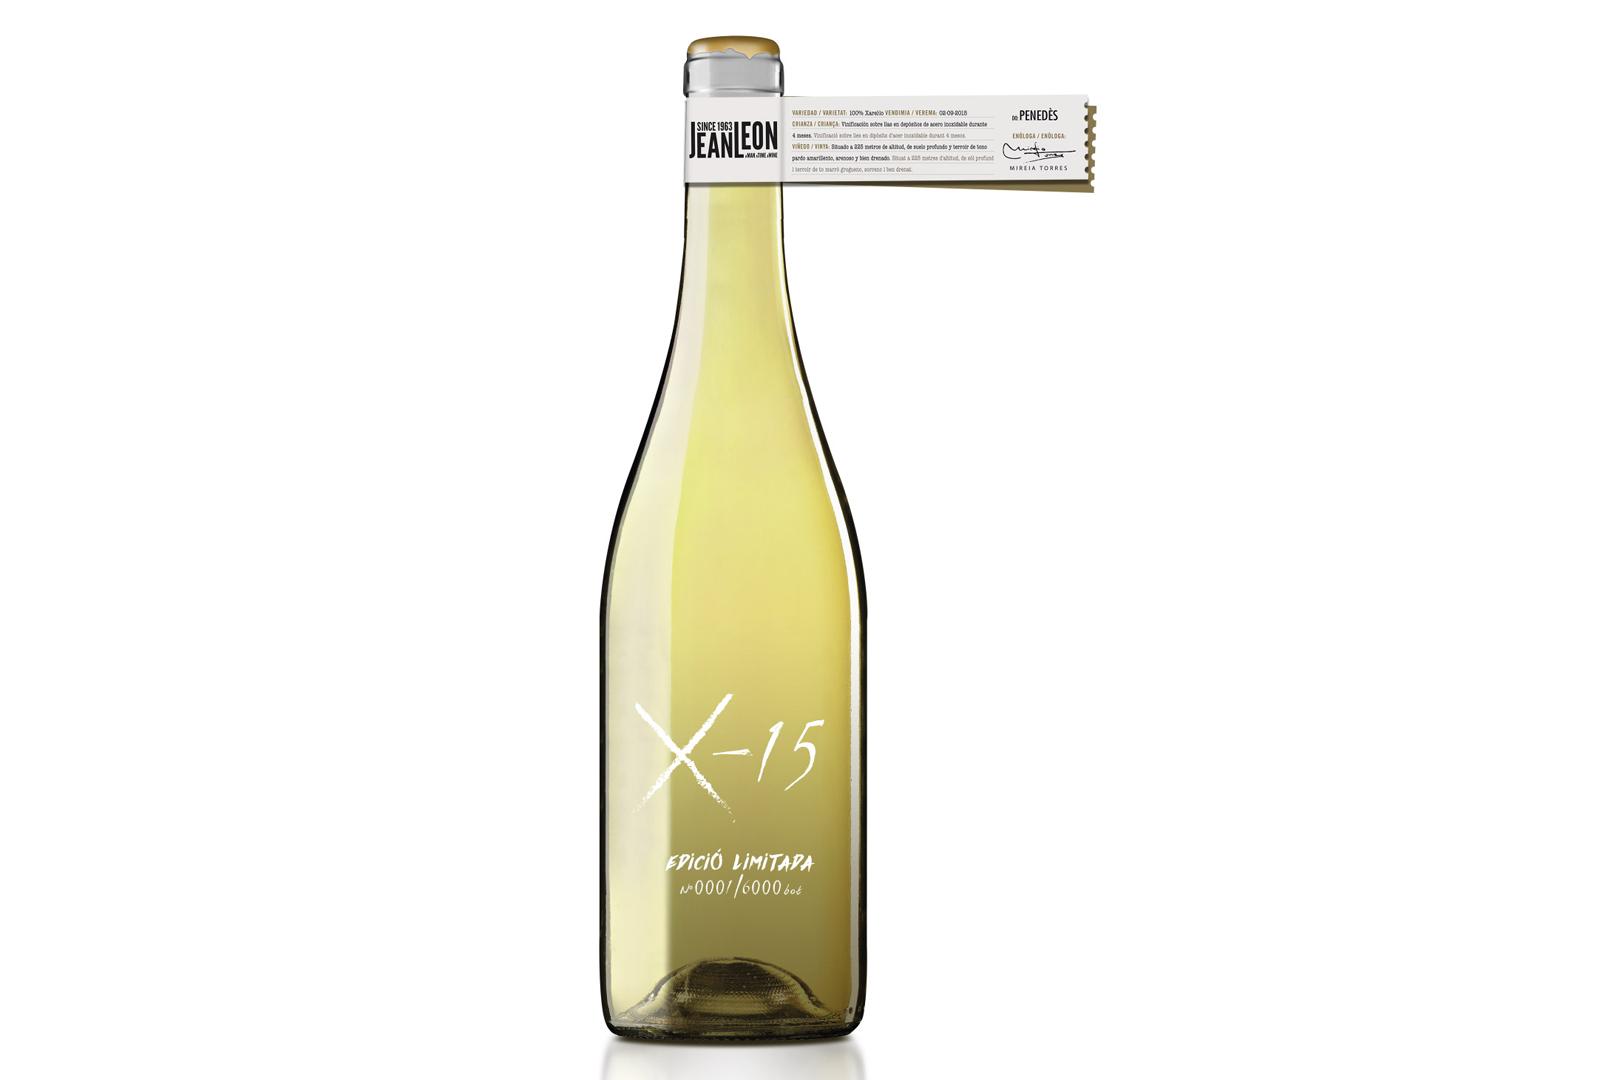 X-15 nuevo vino experimental de Jean Leon